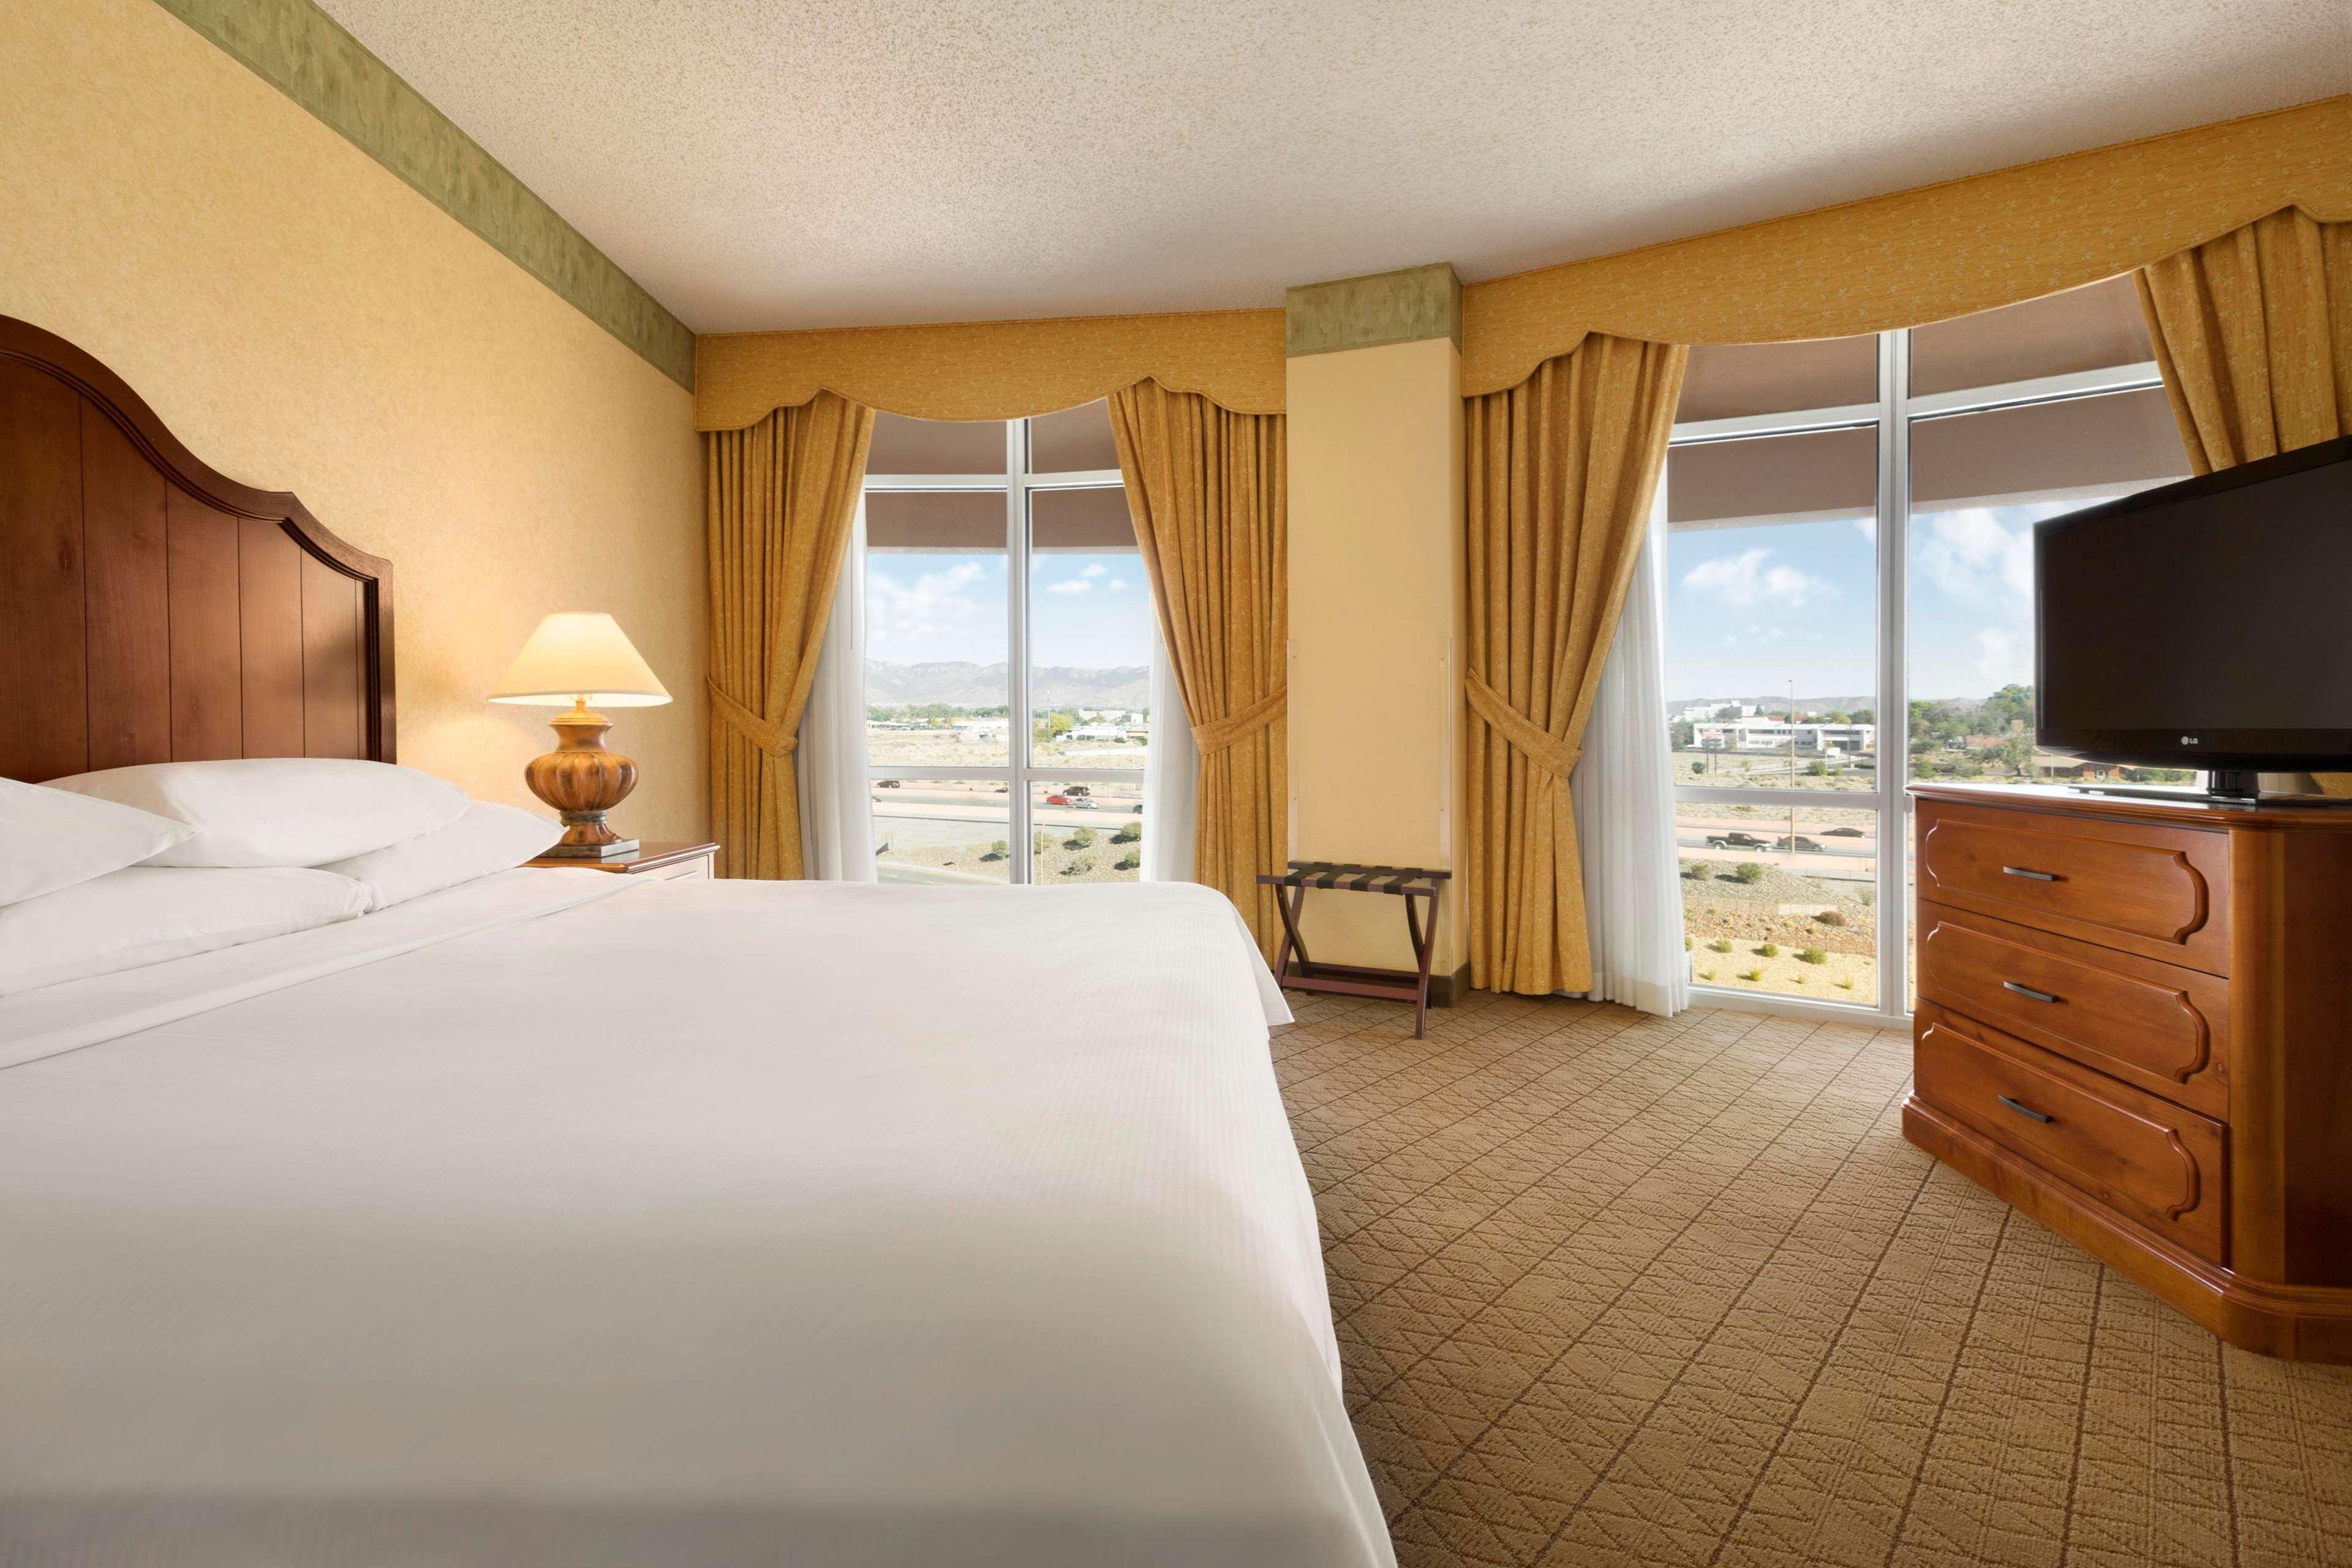 Embassy Suites by Hilton Albuquerque Hotel & Spa image 21